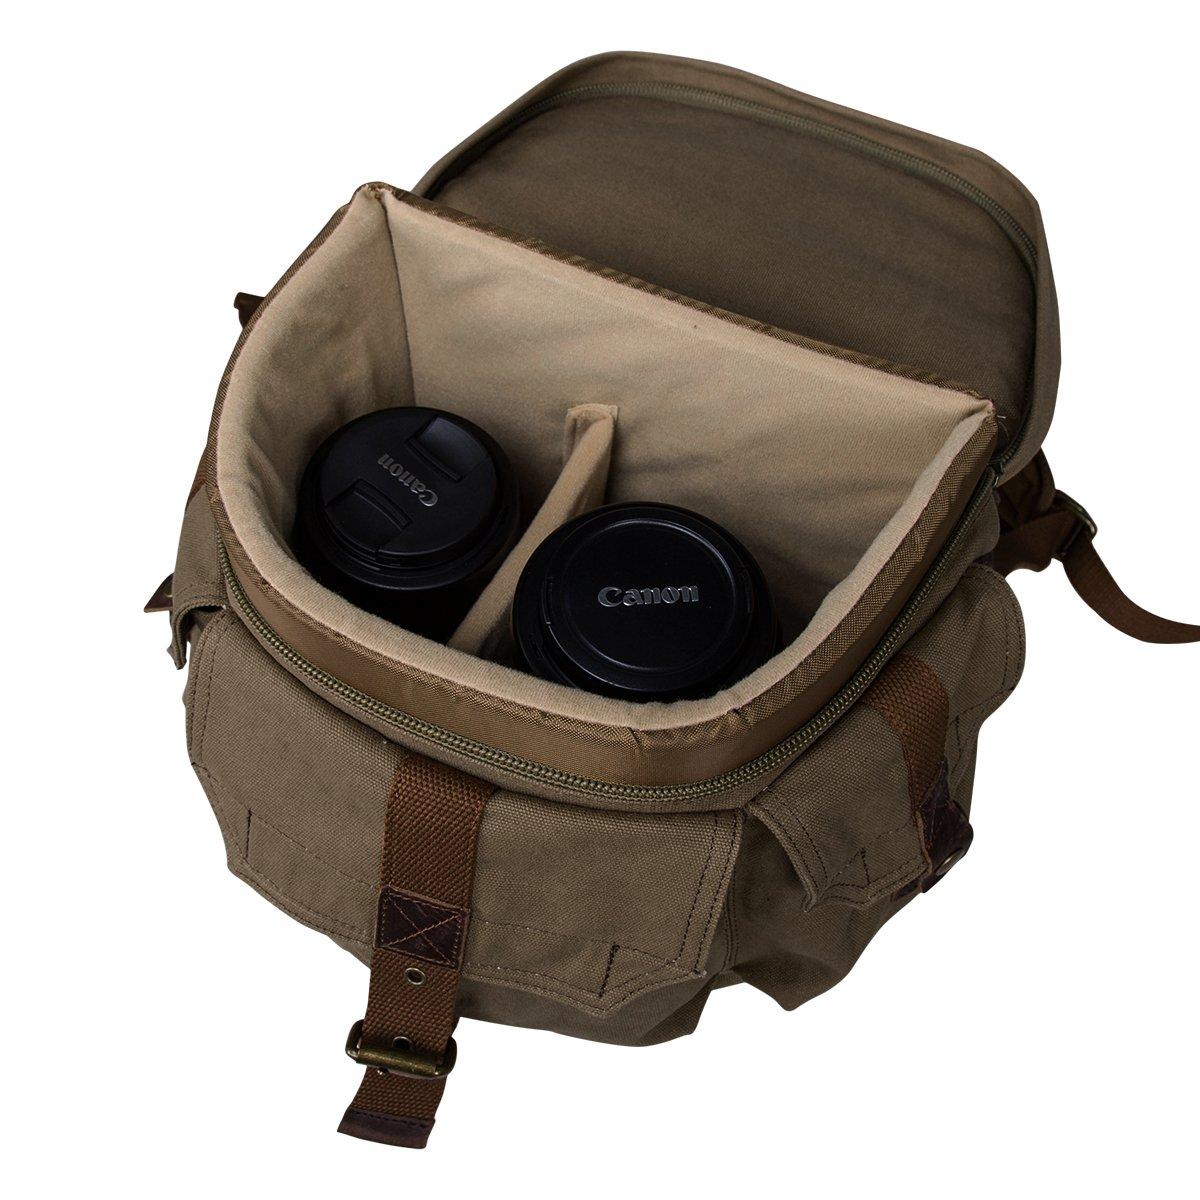 Sparta Adventure Backpack Bag For Olympus PEN E P5 and Mini Tripod PEN E PL5 PEN E PM2 E PL7 Digital Camera and Screen Protector x2